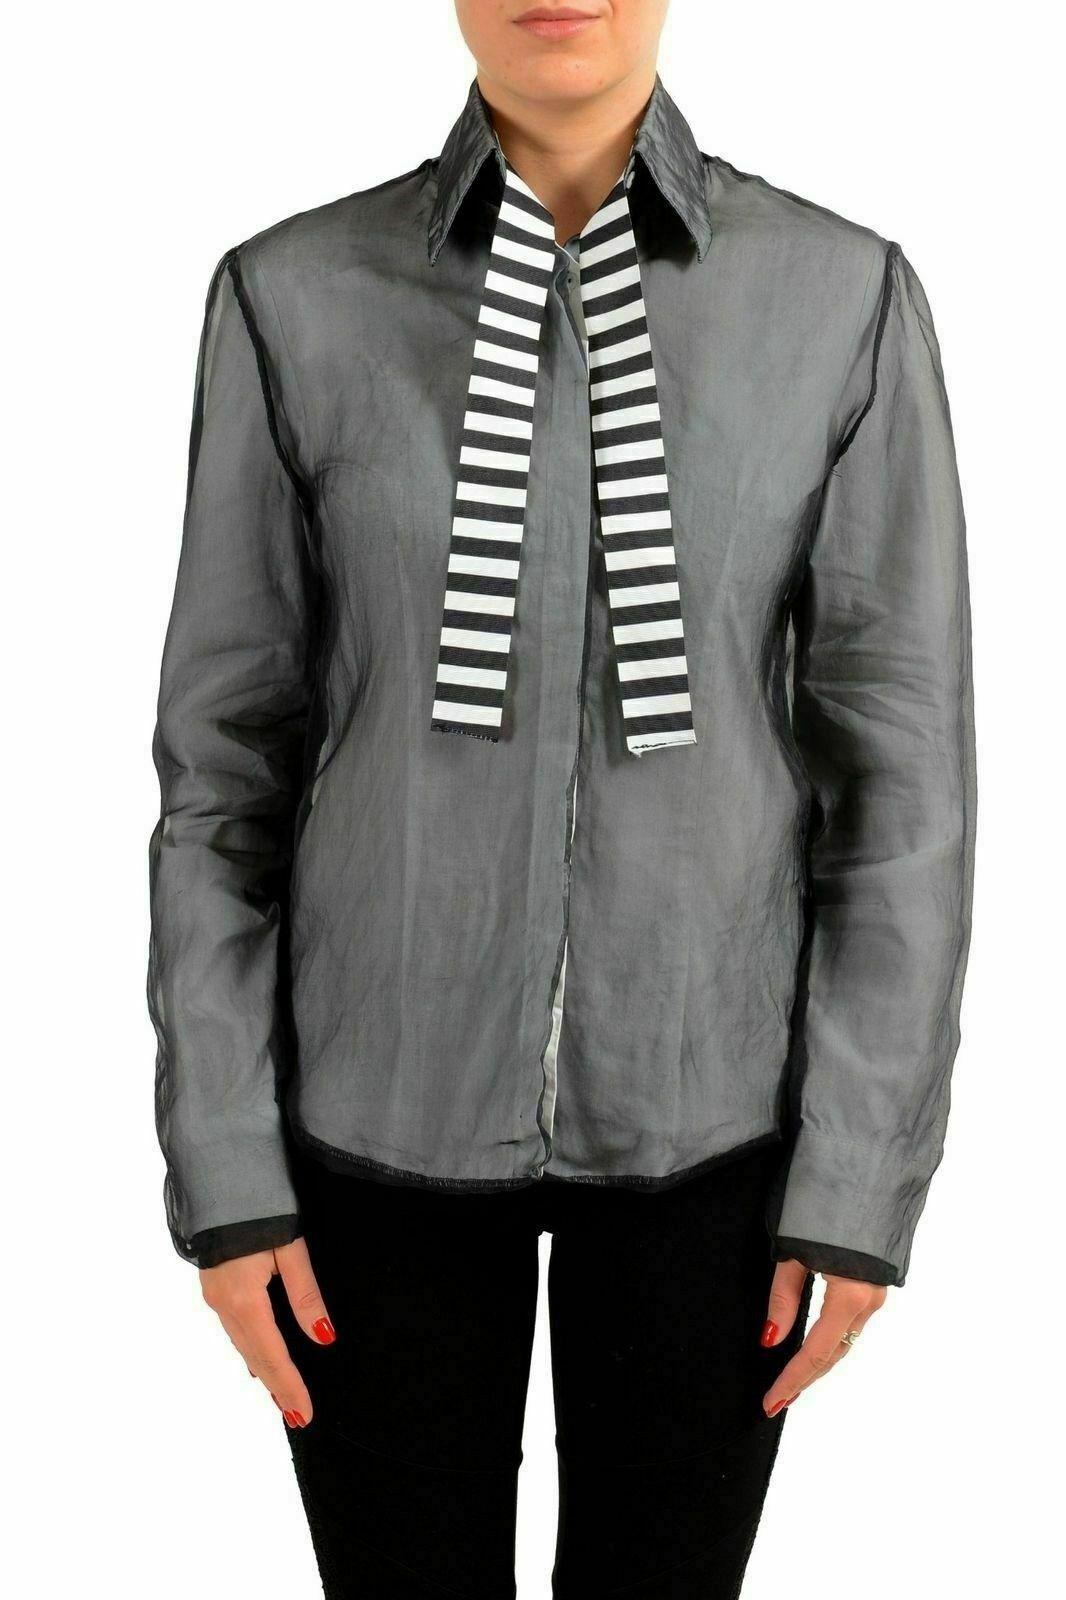 Gianfranco Ferre GF Woherren Silk Layerot Button Down Shirt Blouse US XS IT 38